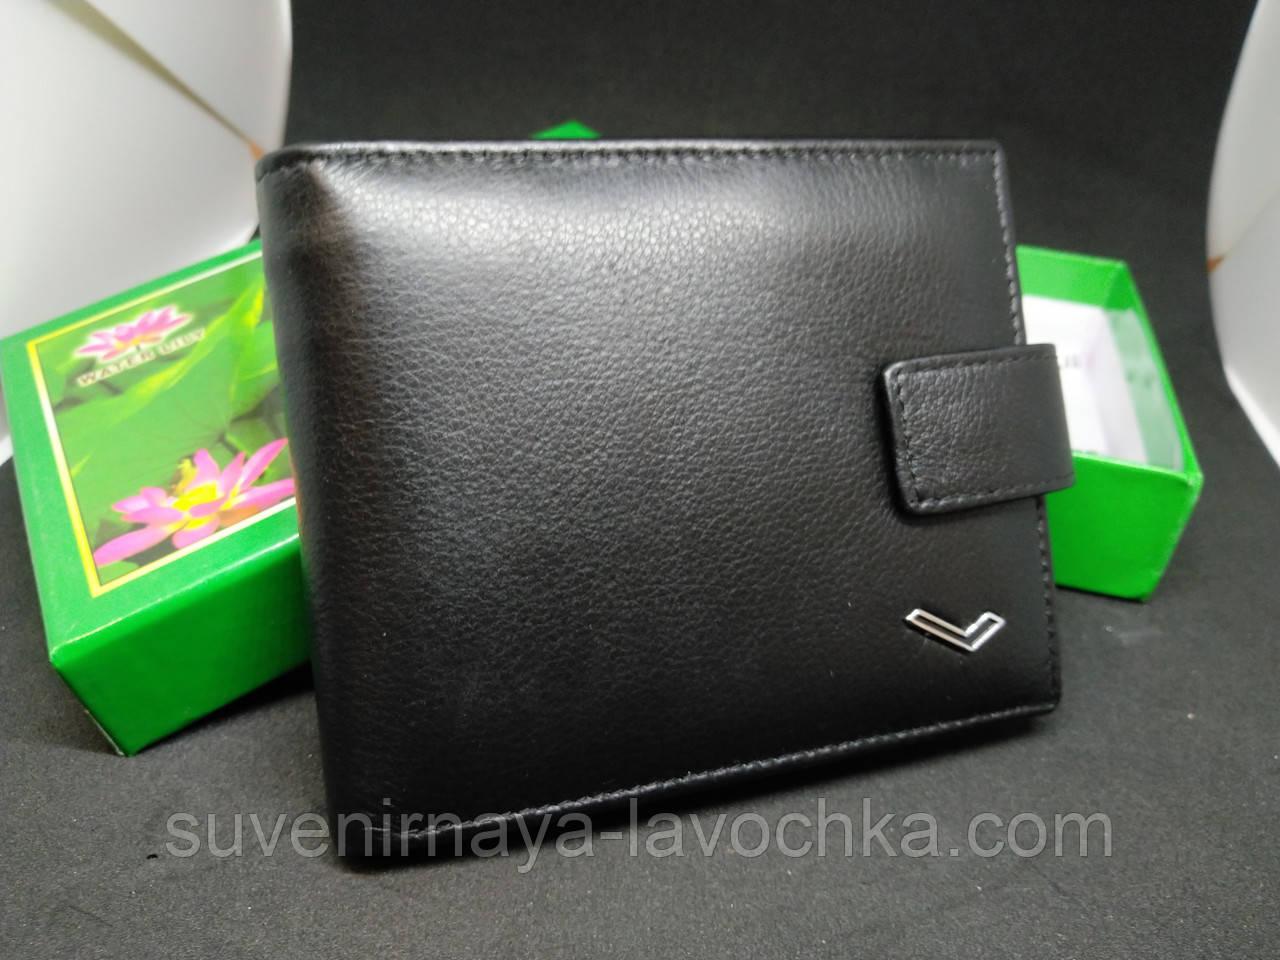 Мужской кошелек Classic кожа Water Lily 0712-A black Фирменный